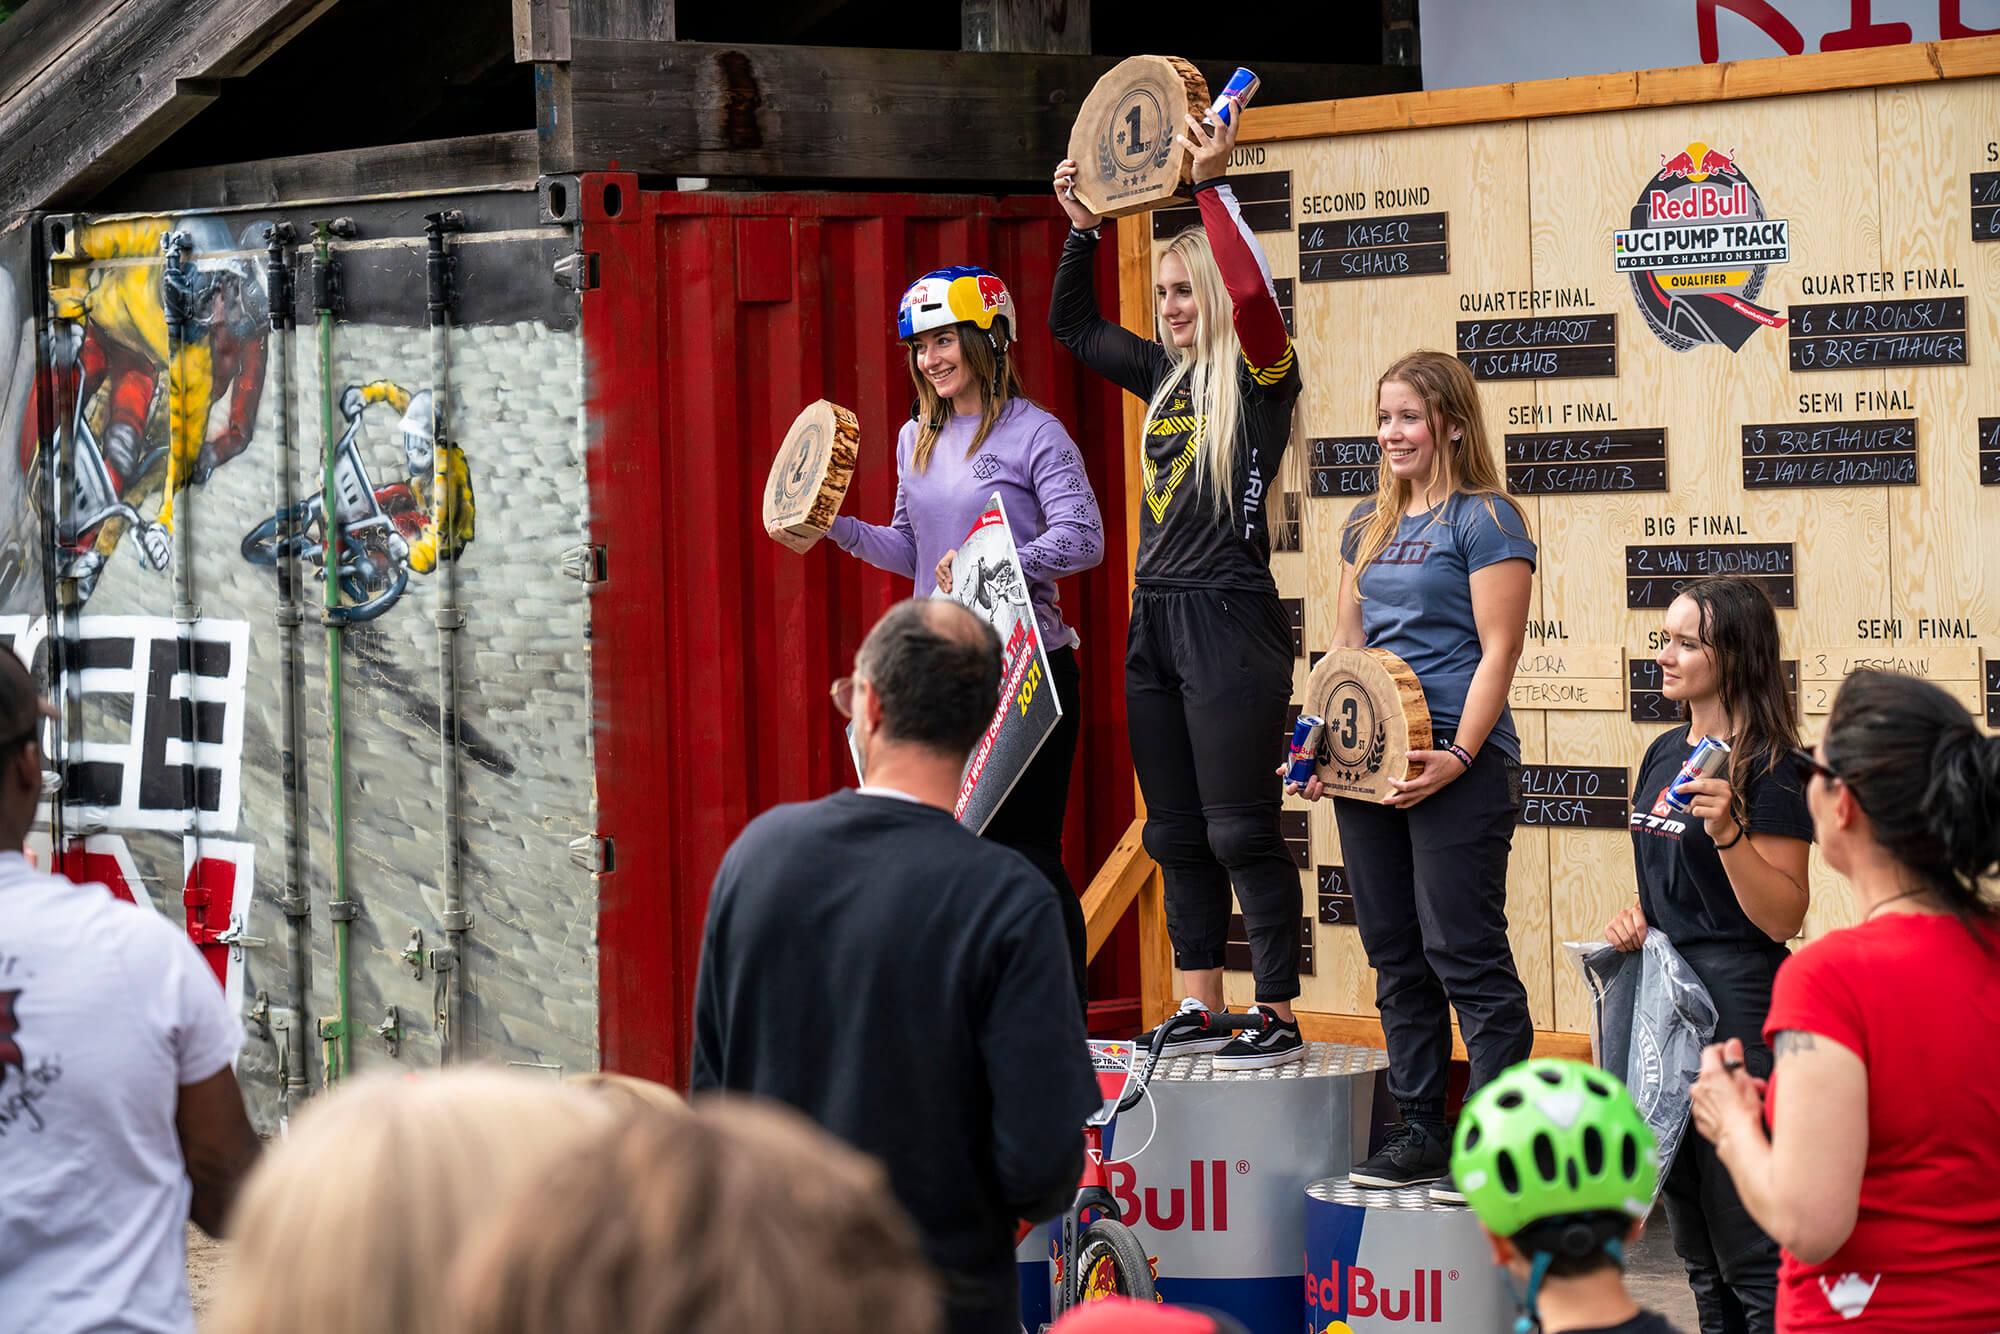 Red Bull Pump Track Qualifier Mellowpark Aug 2021 - Thomas Dietze -420